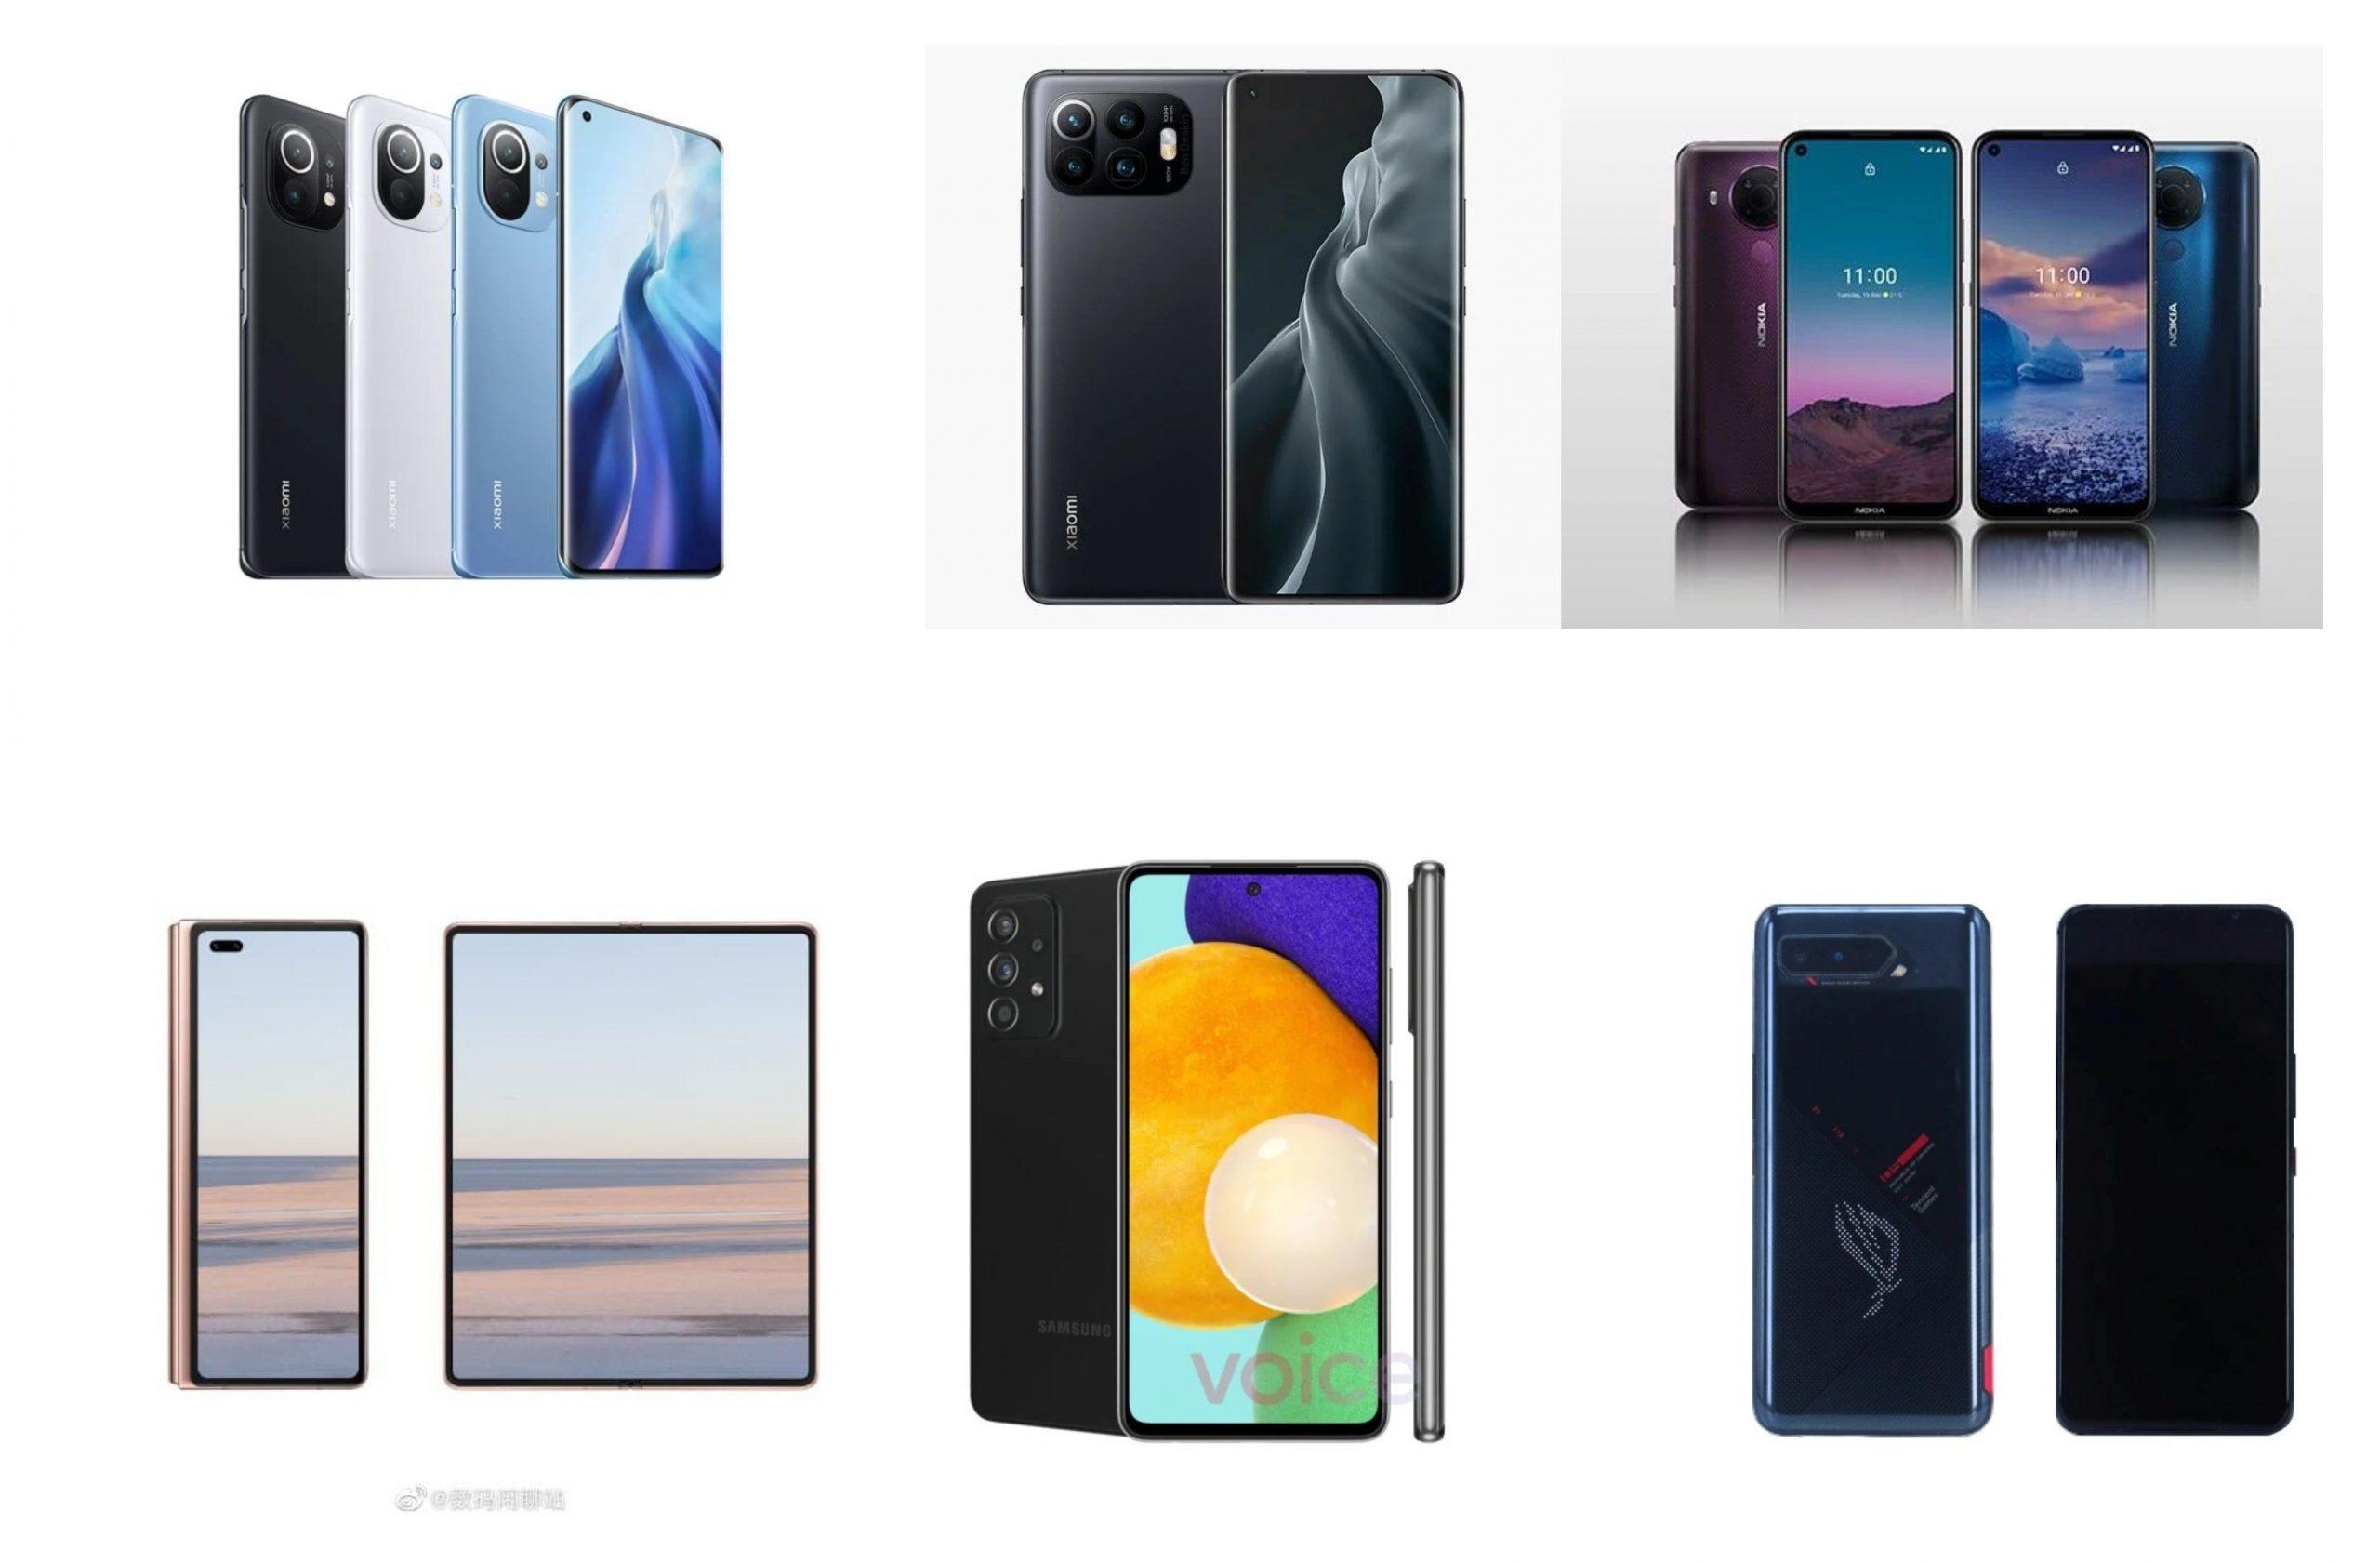 February 2021 phones